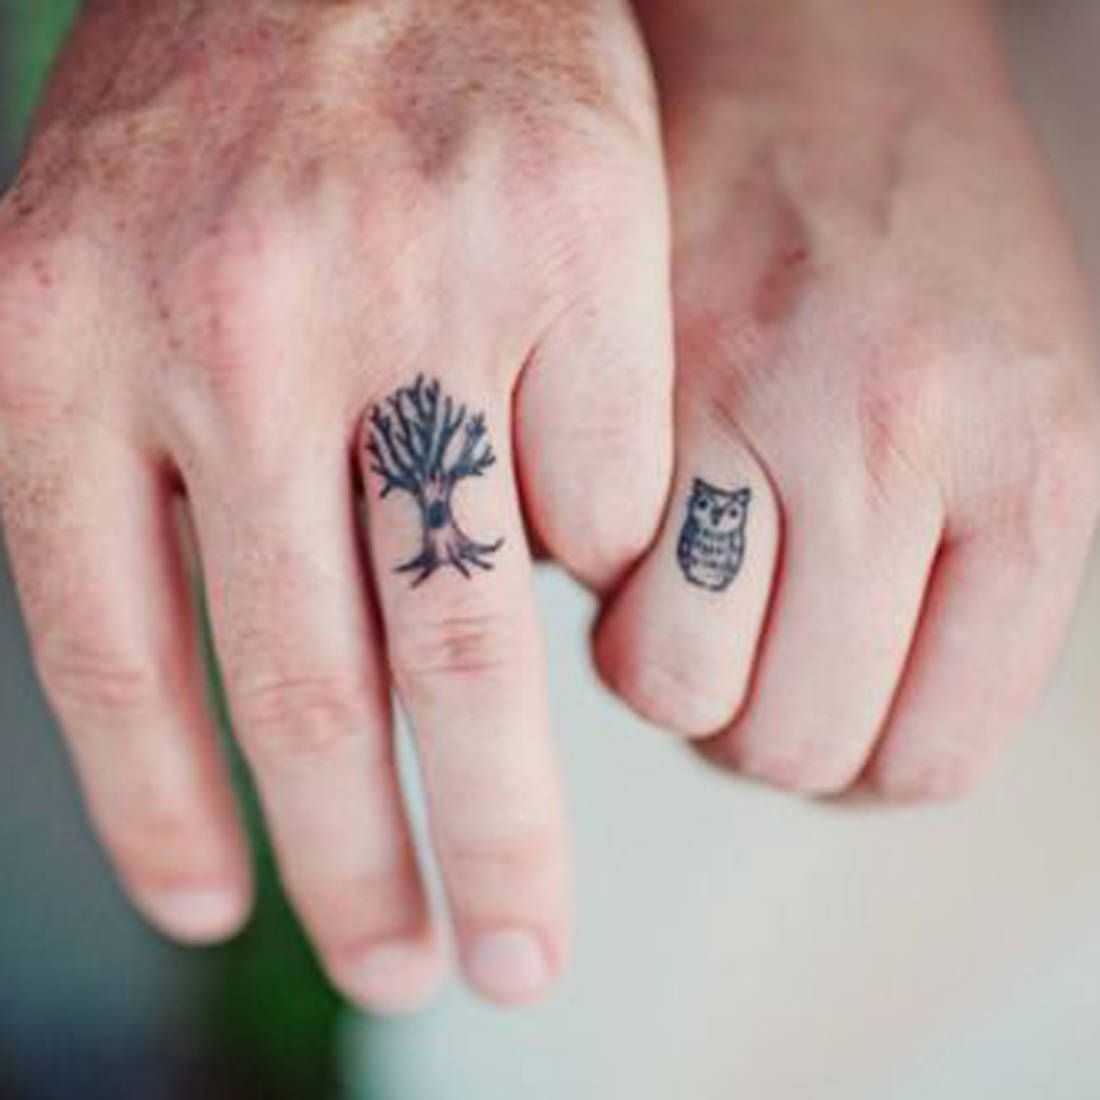 55 romantic wedding ring finger tattoo designs and ideas - Tattoo